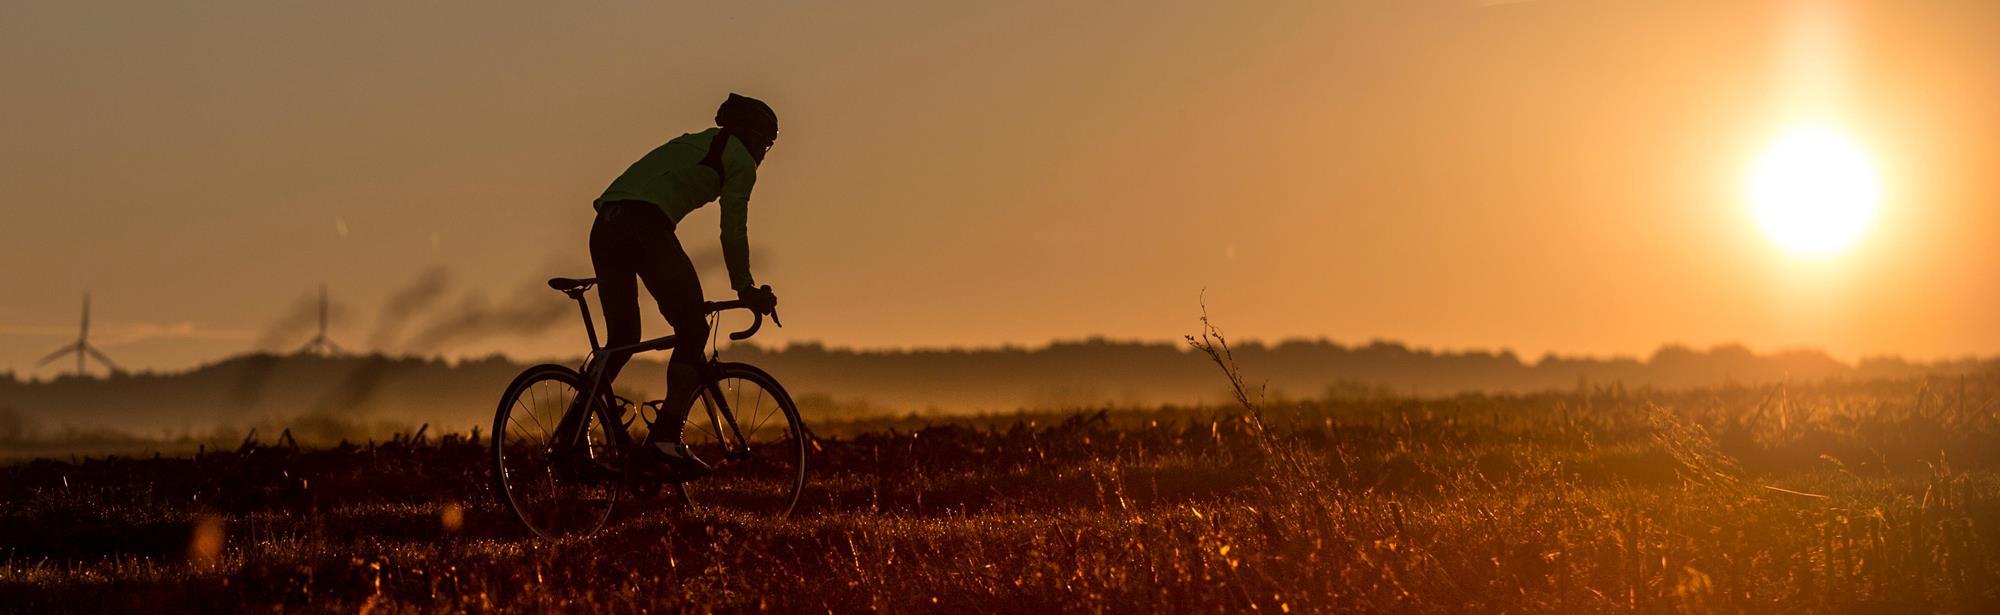 Amstel Gold Race-Lus 2 Zuid-Limburg